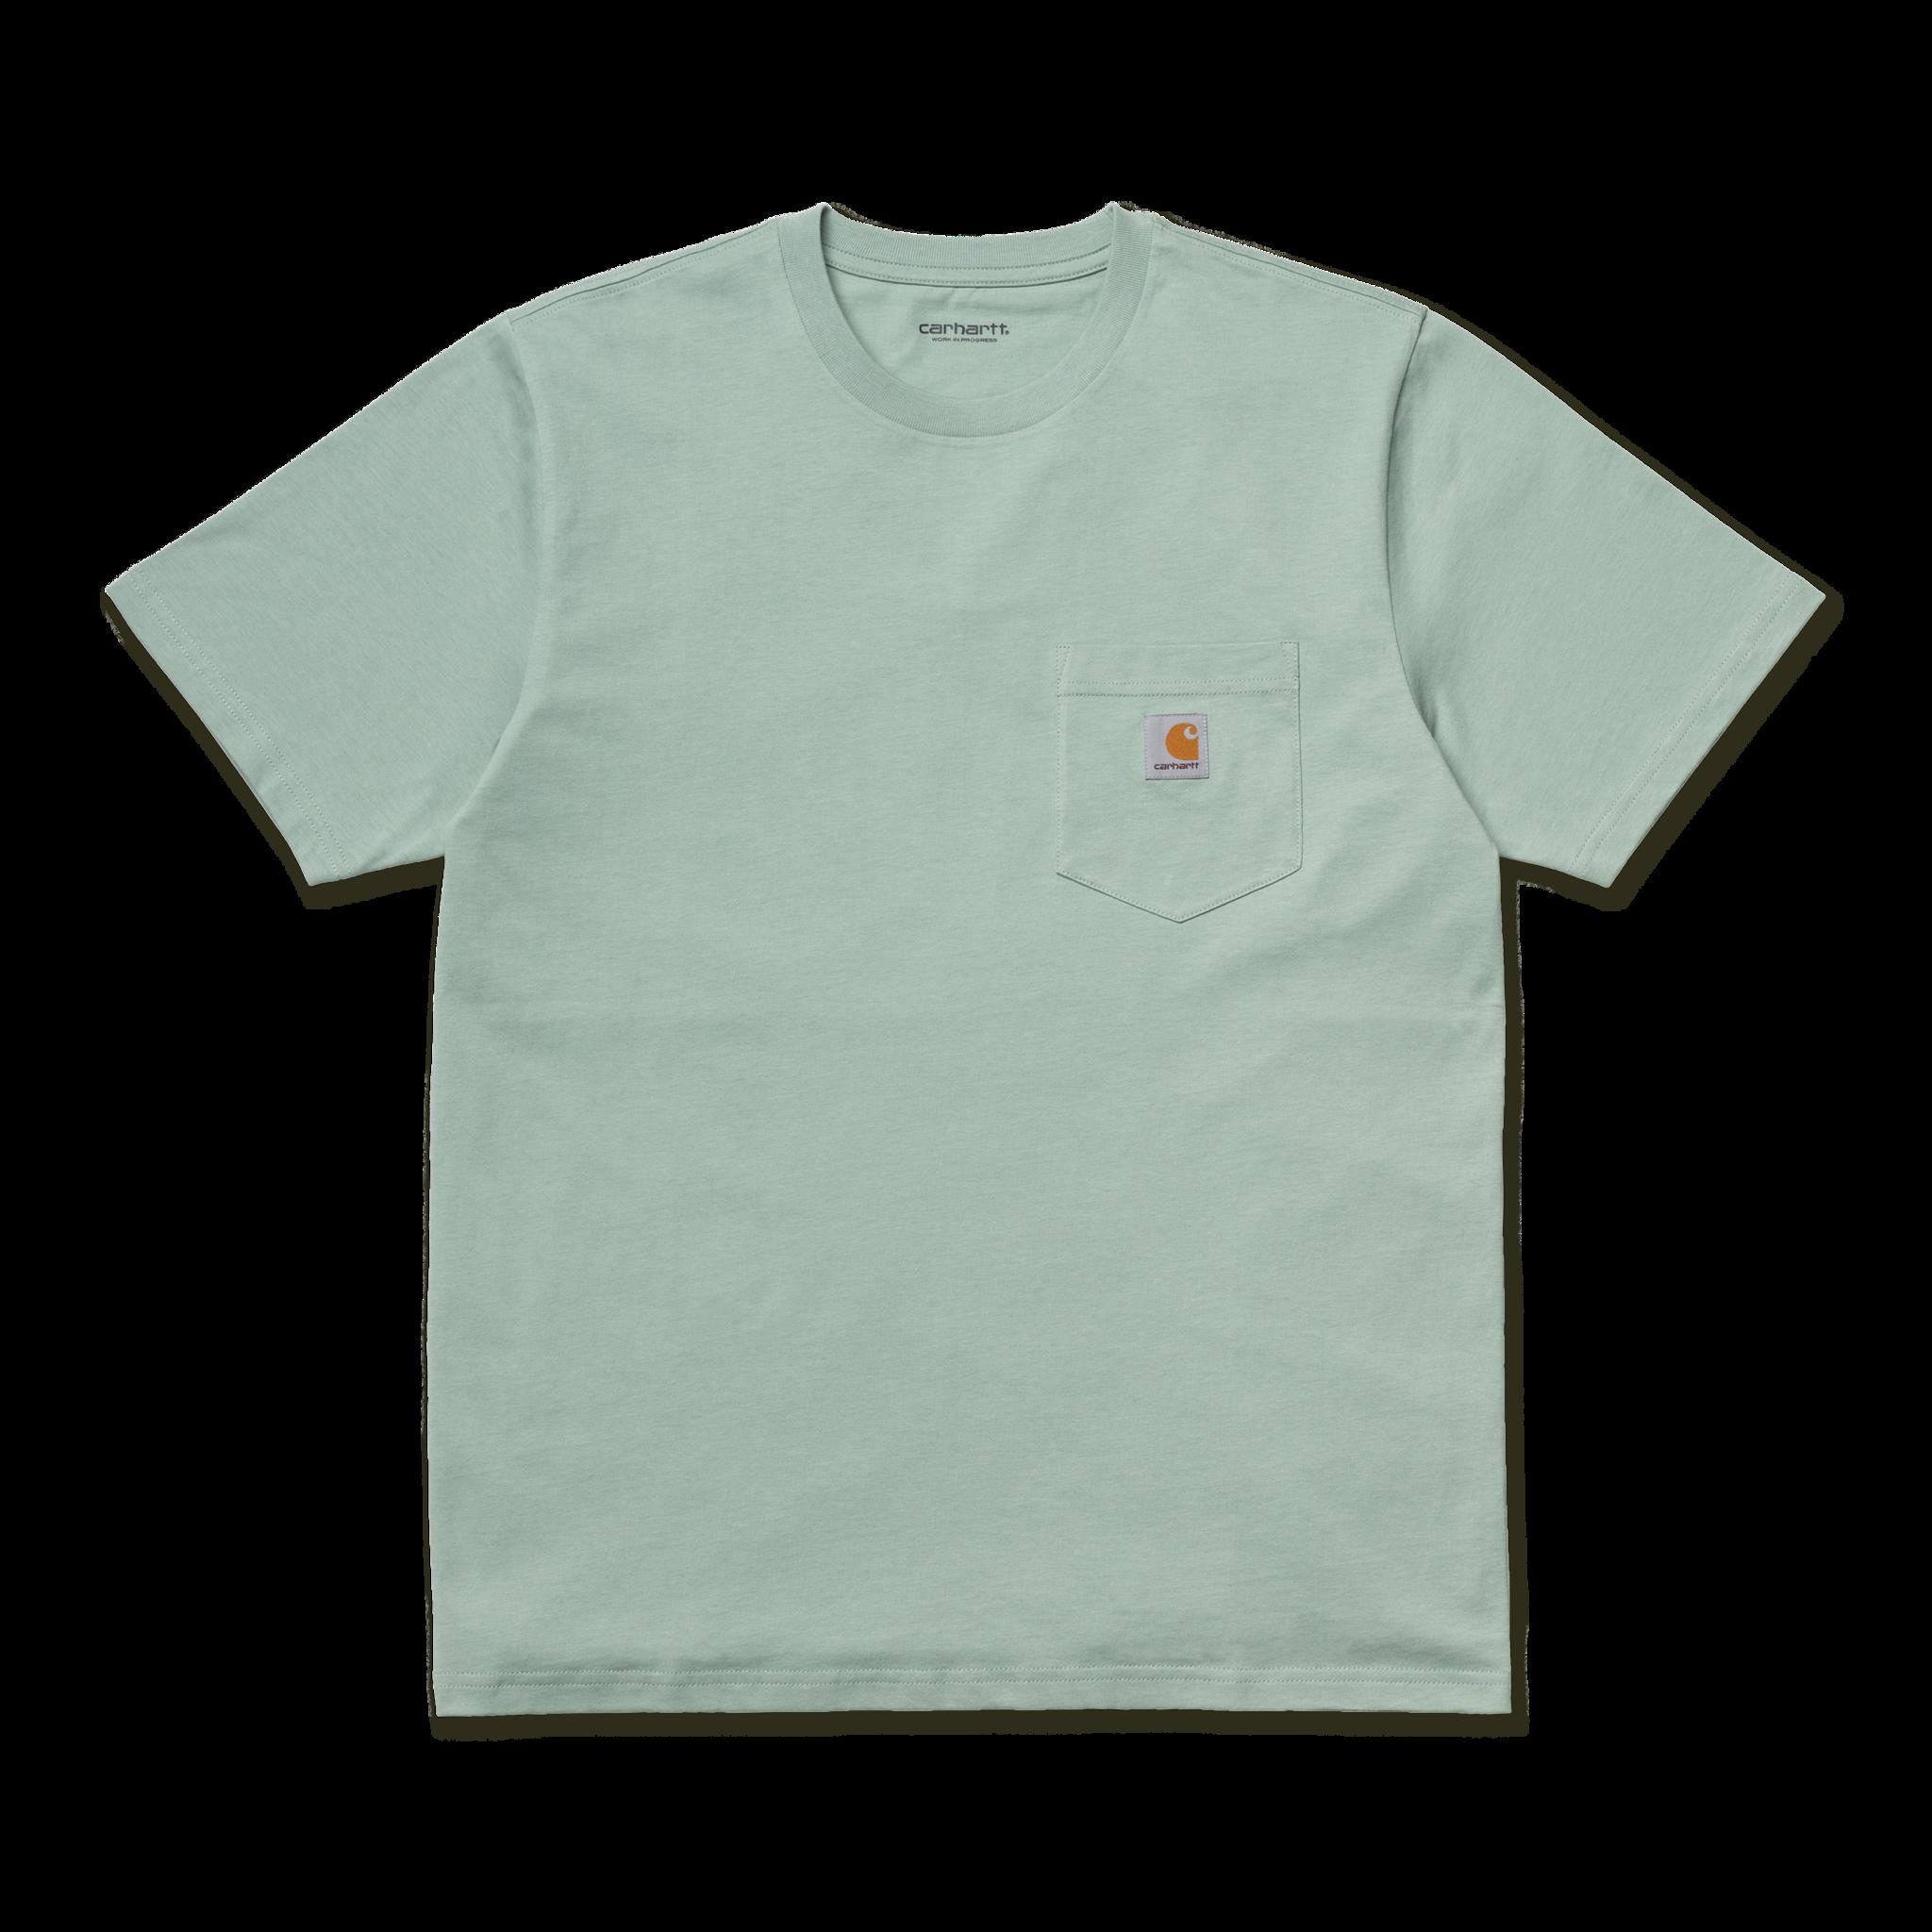 Carhartt Work In Progress Pocket T-shirt in Frosted Green